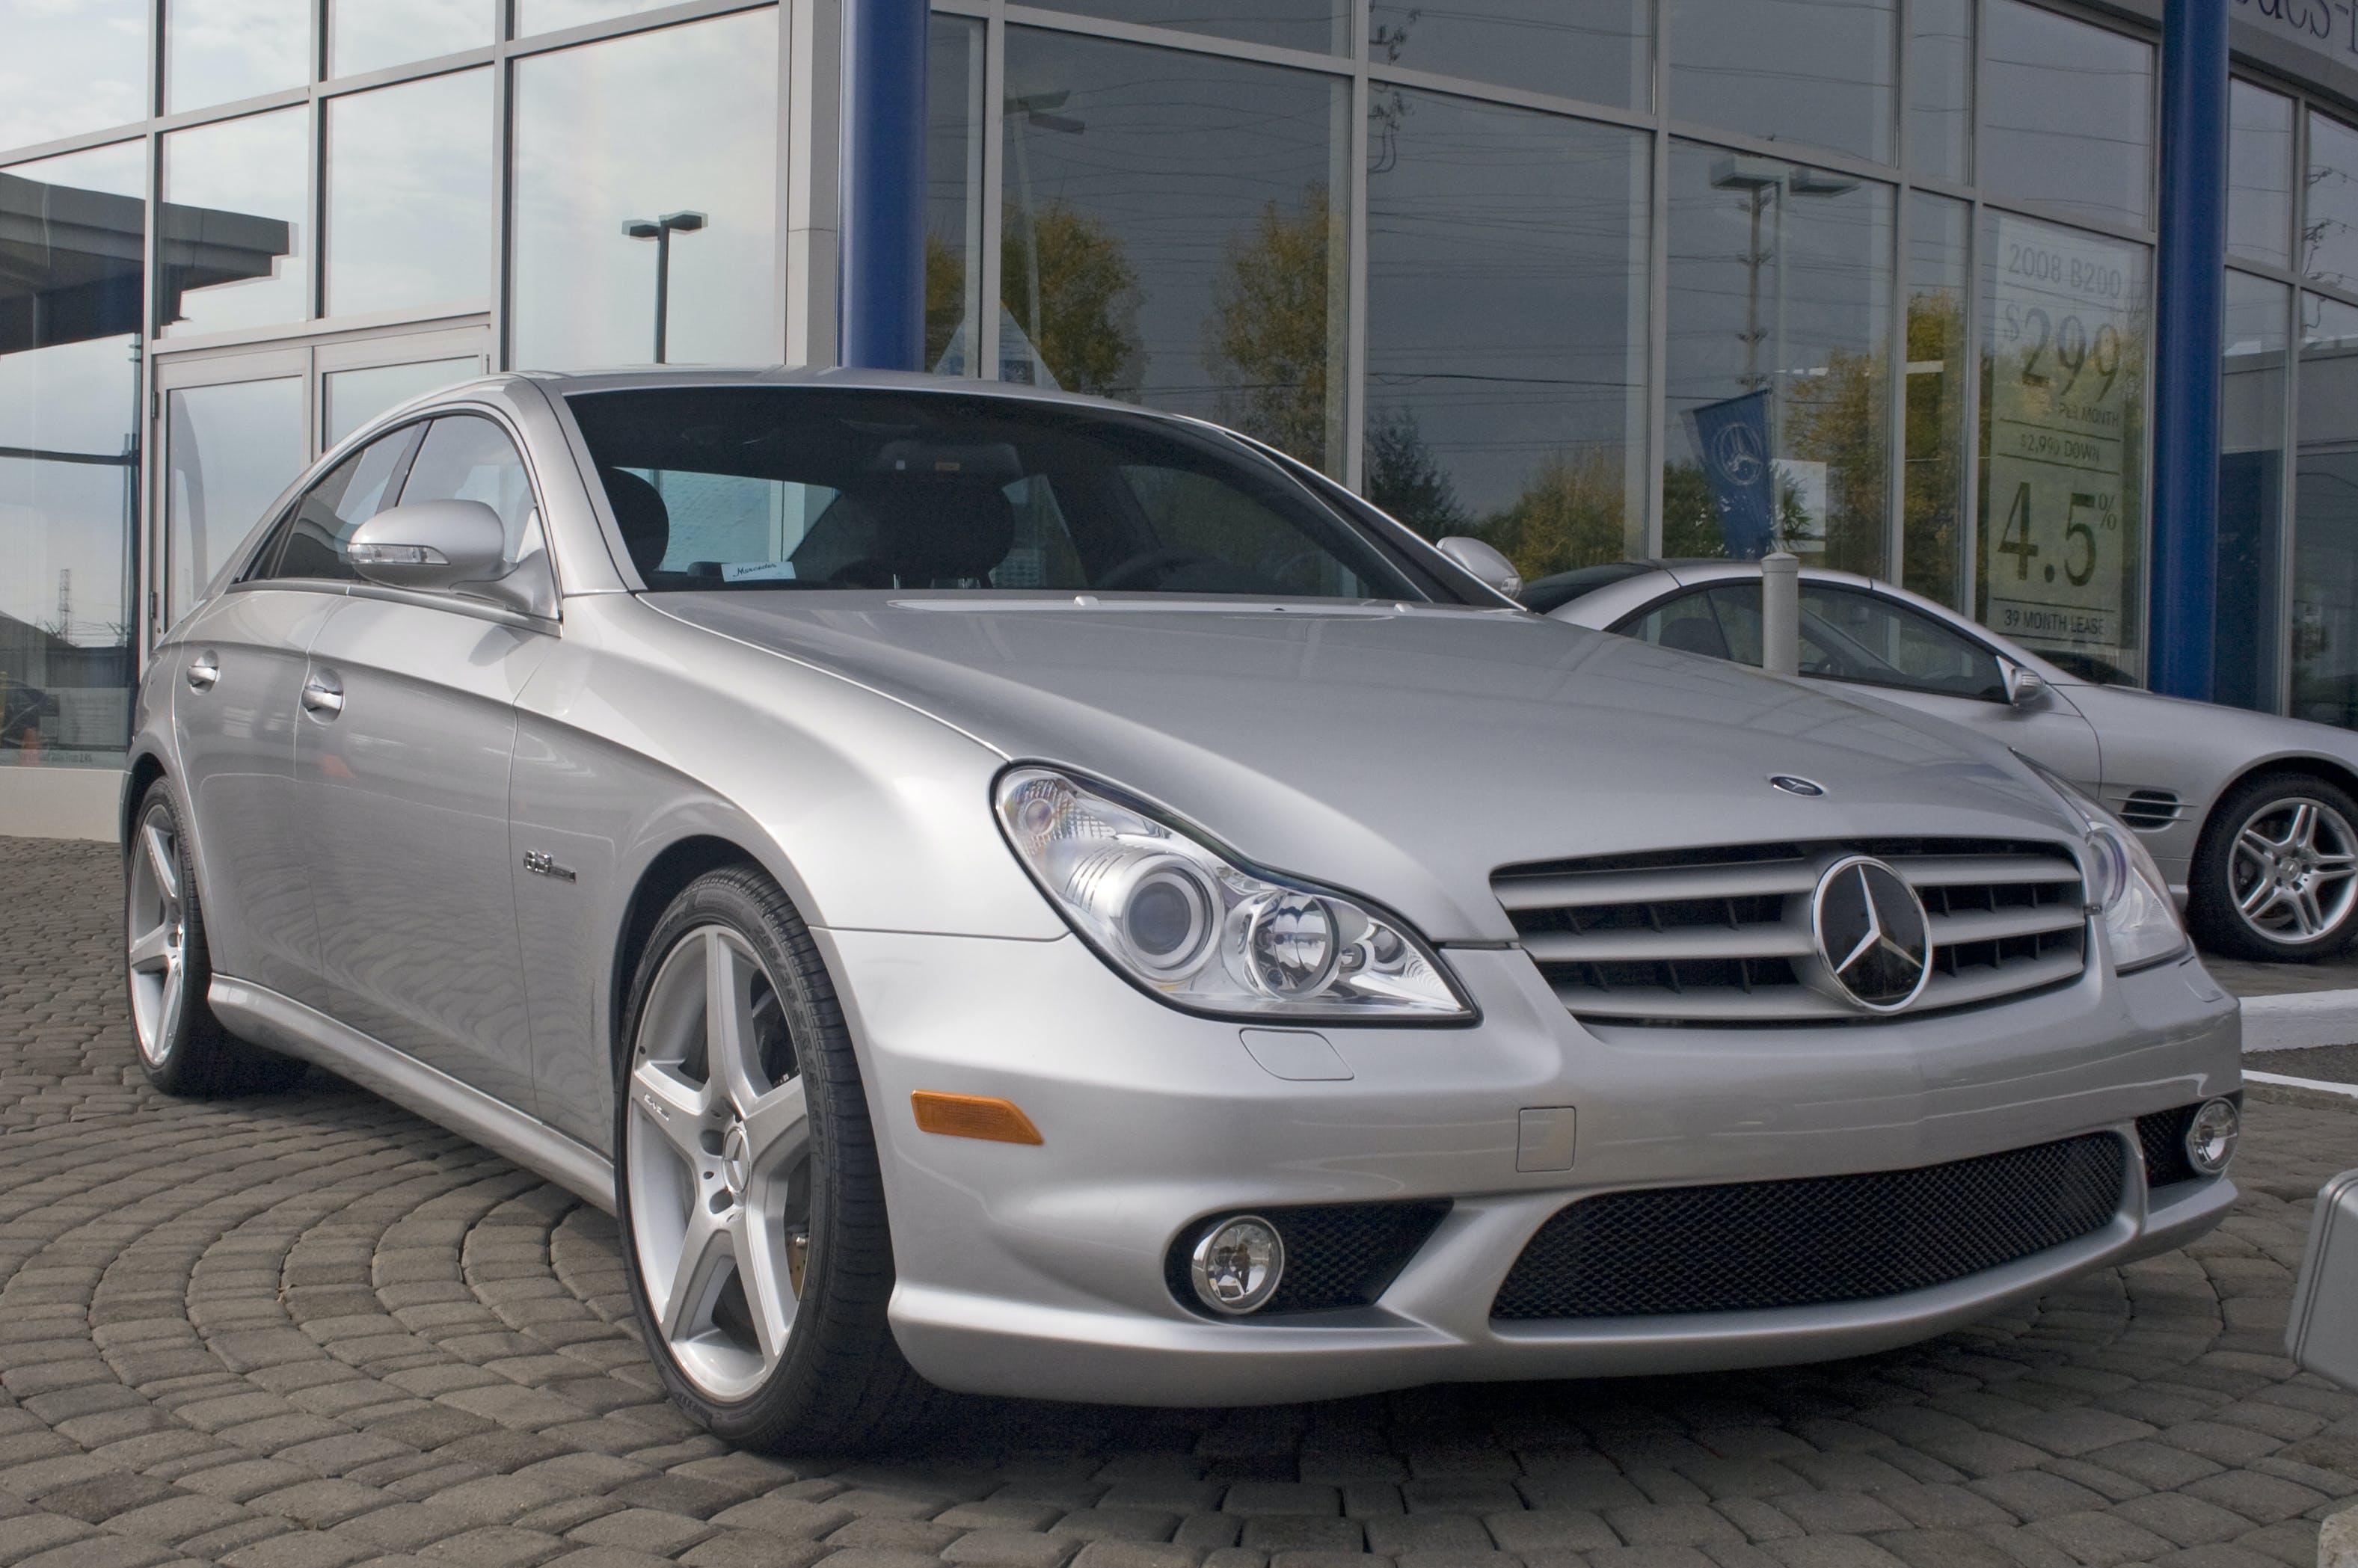 car, car dealership, luxurious